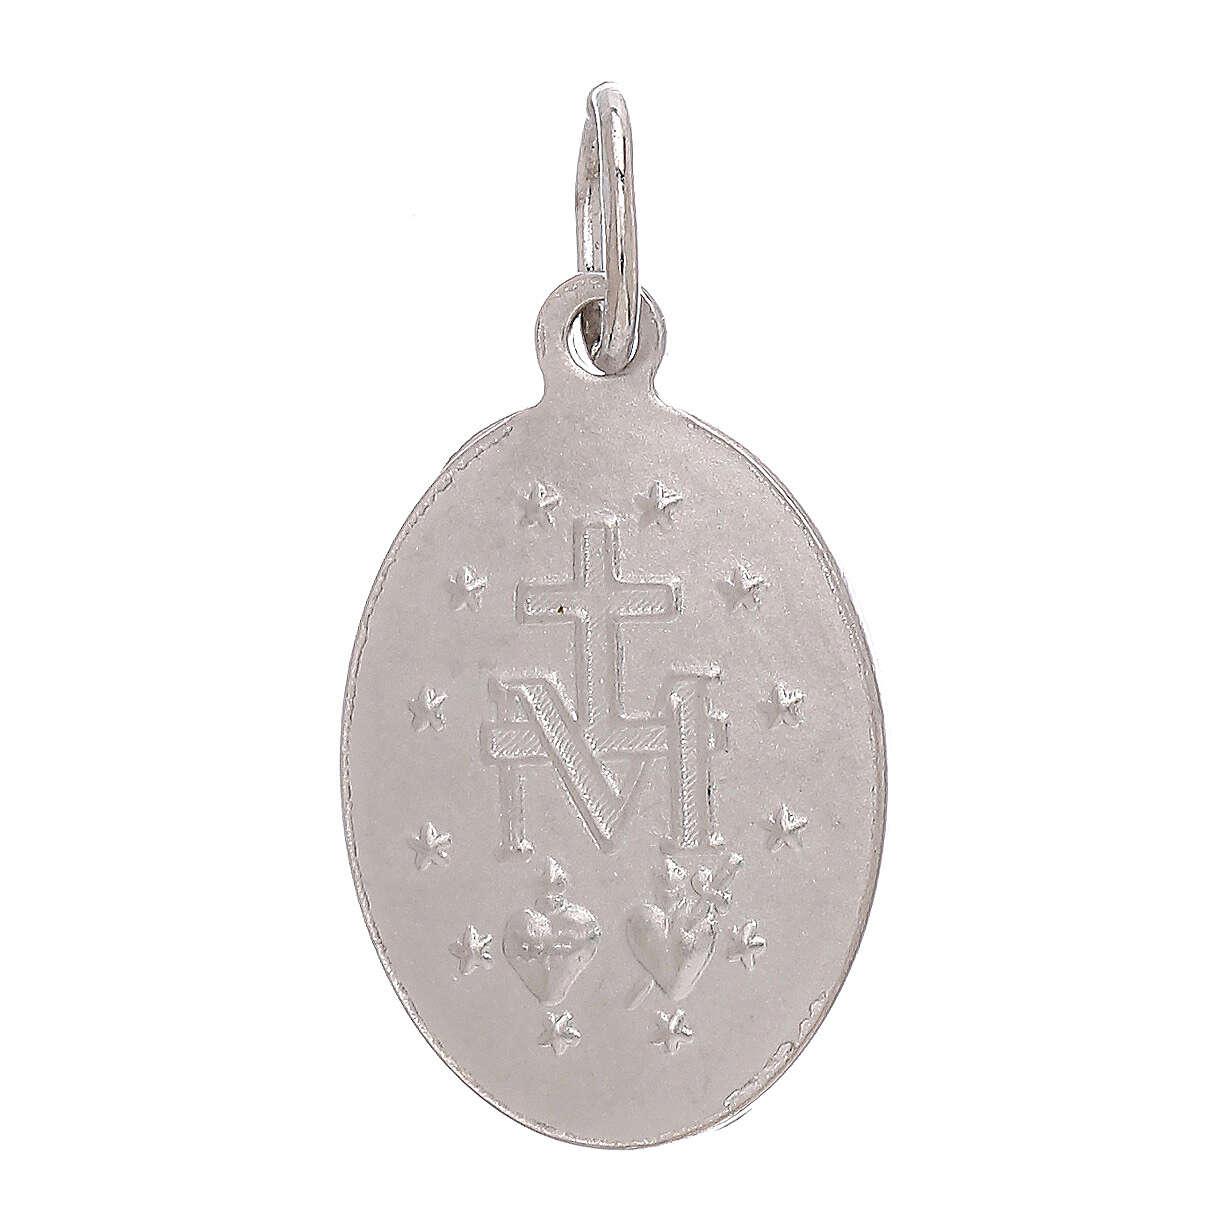 Miraculous Medal pendant 18-carat white gold 1.8 gr 4